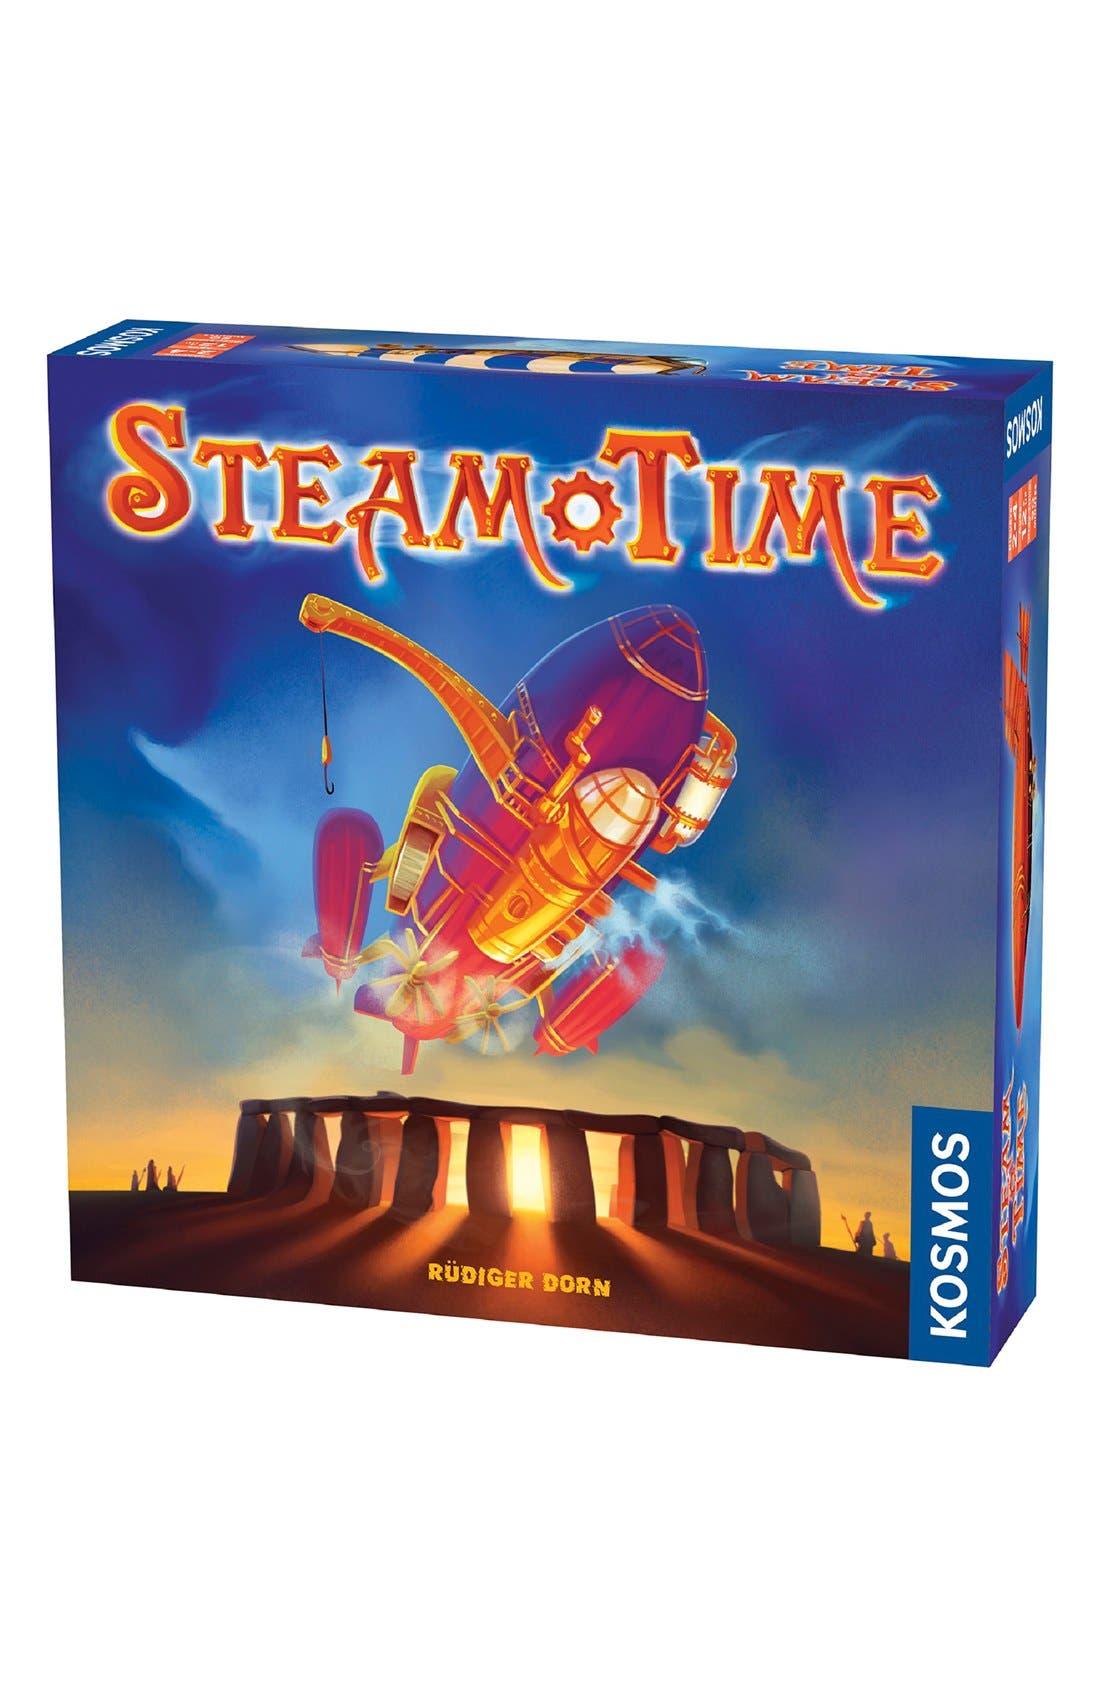 Thames & Kosmos 'Steam Time' Board Game